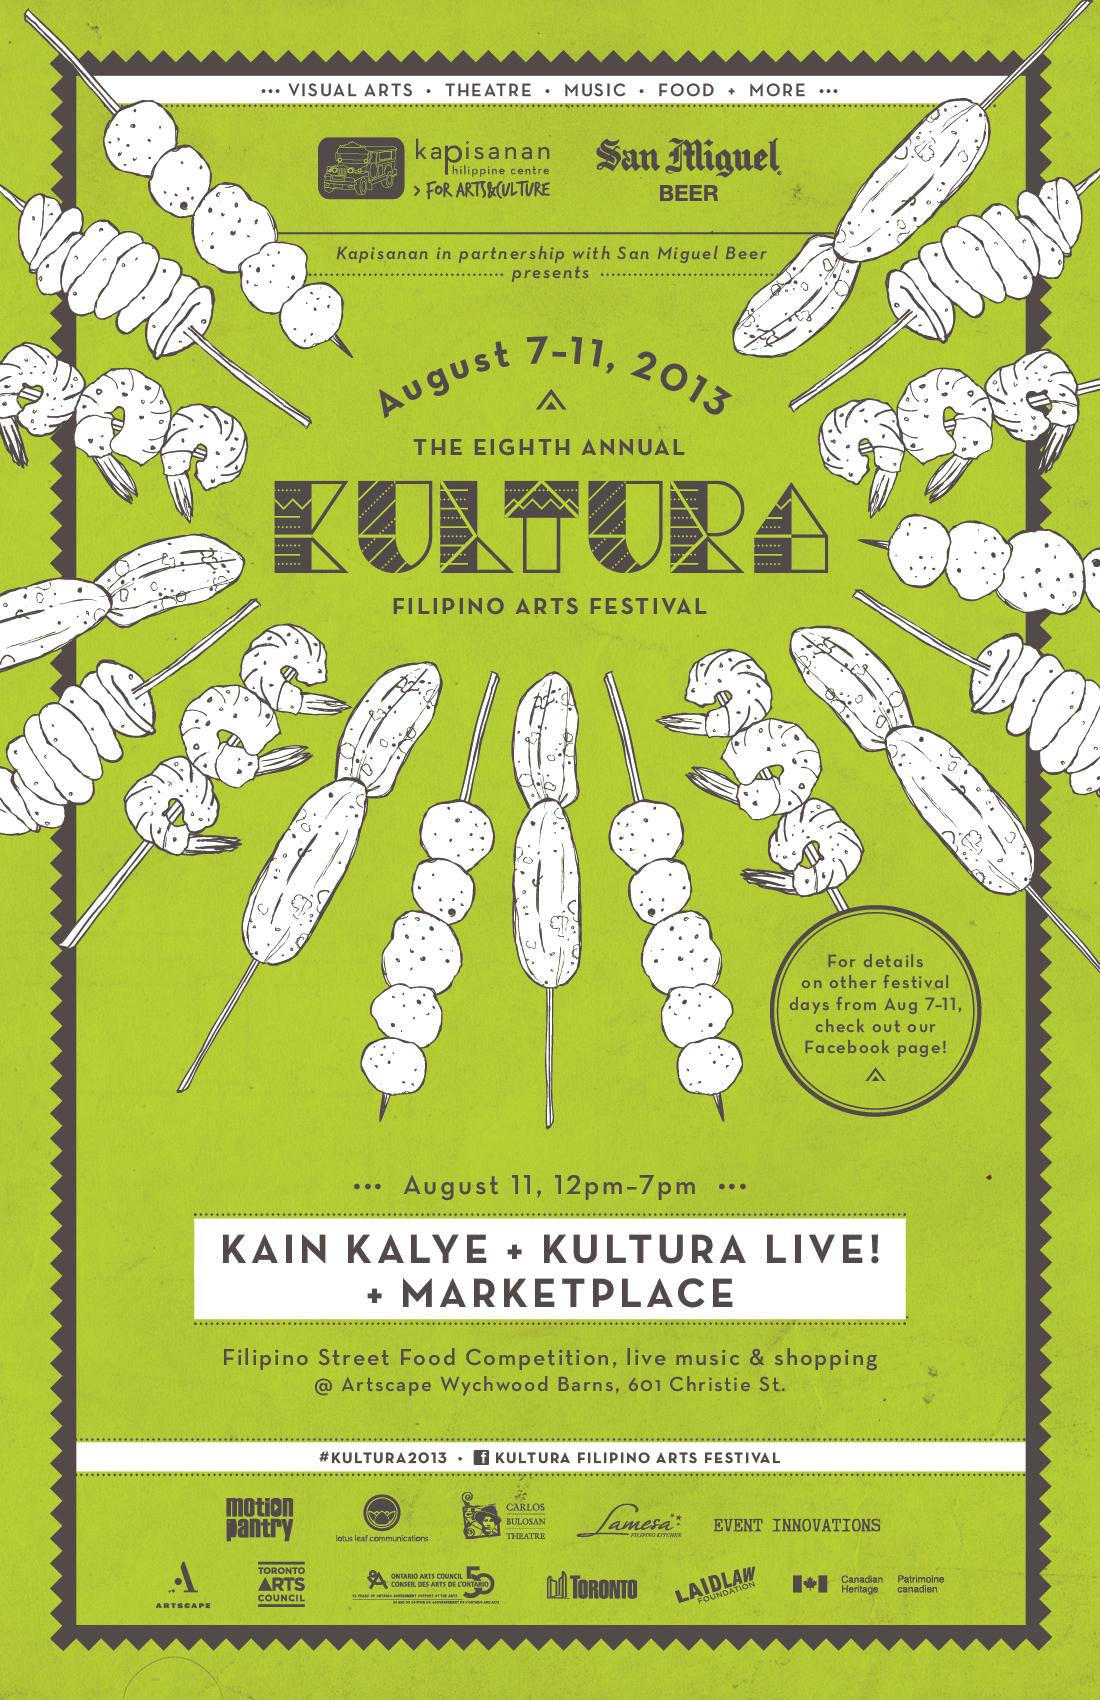 KULTURA 2013 - 8th Annual Kultura Filipino Arts Festival